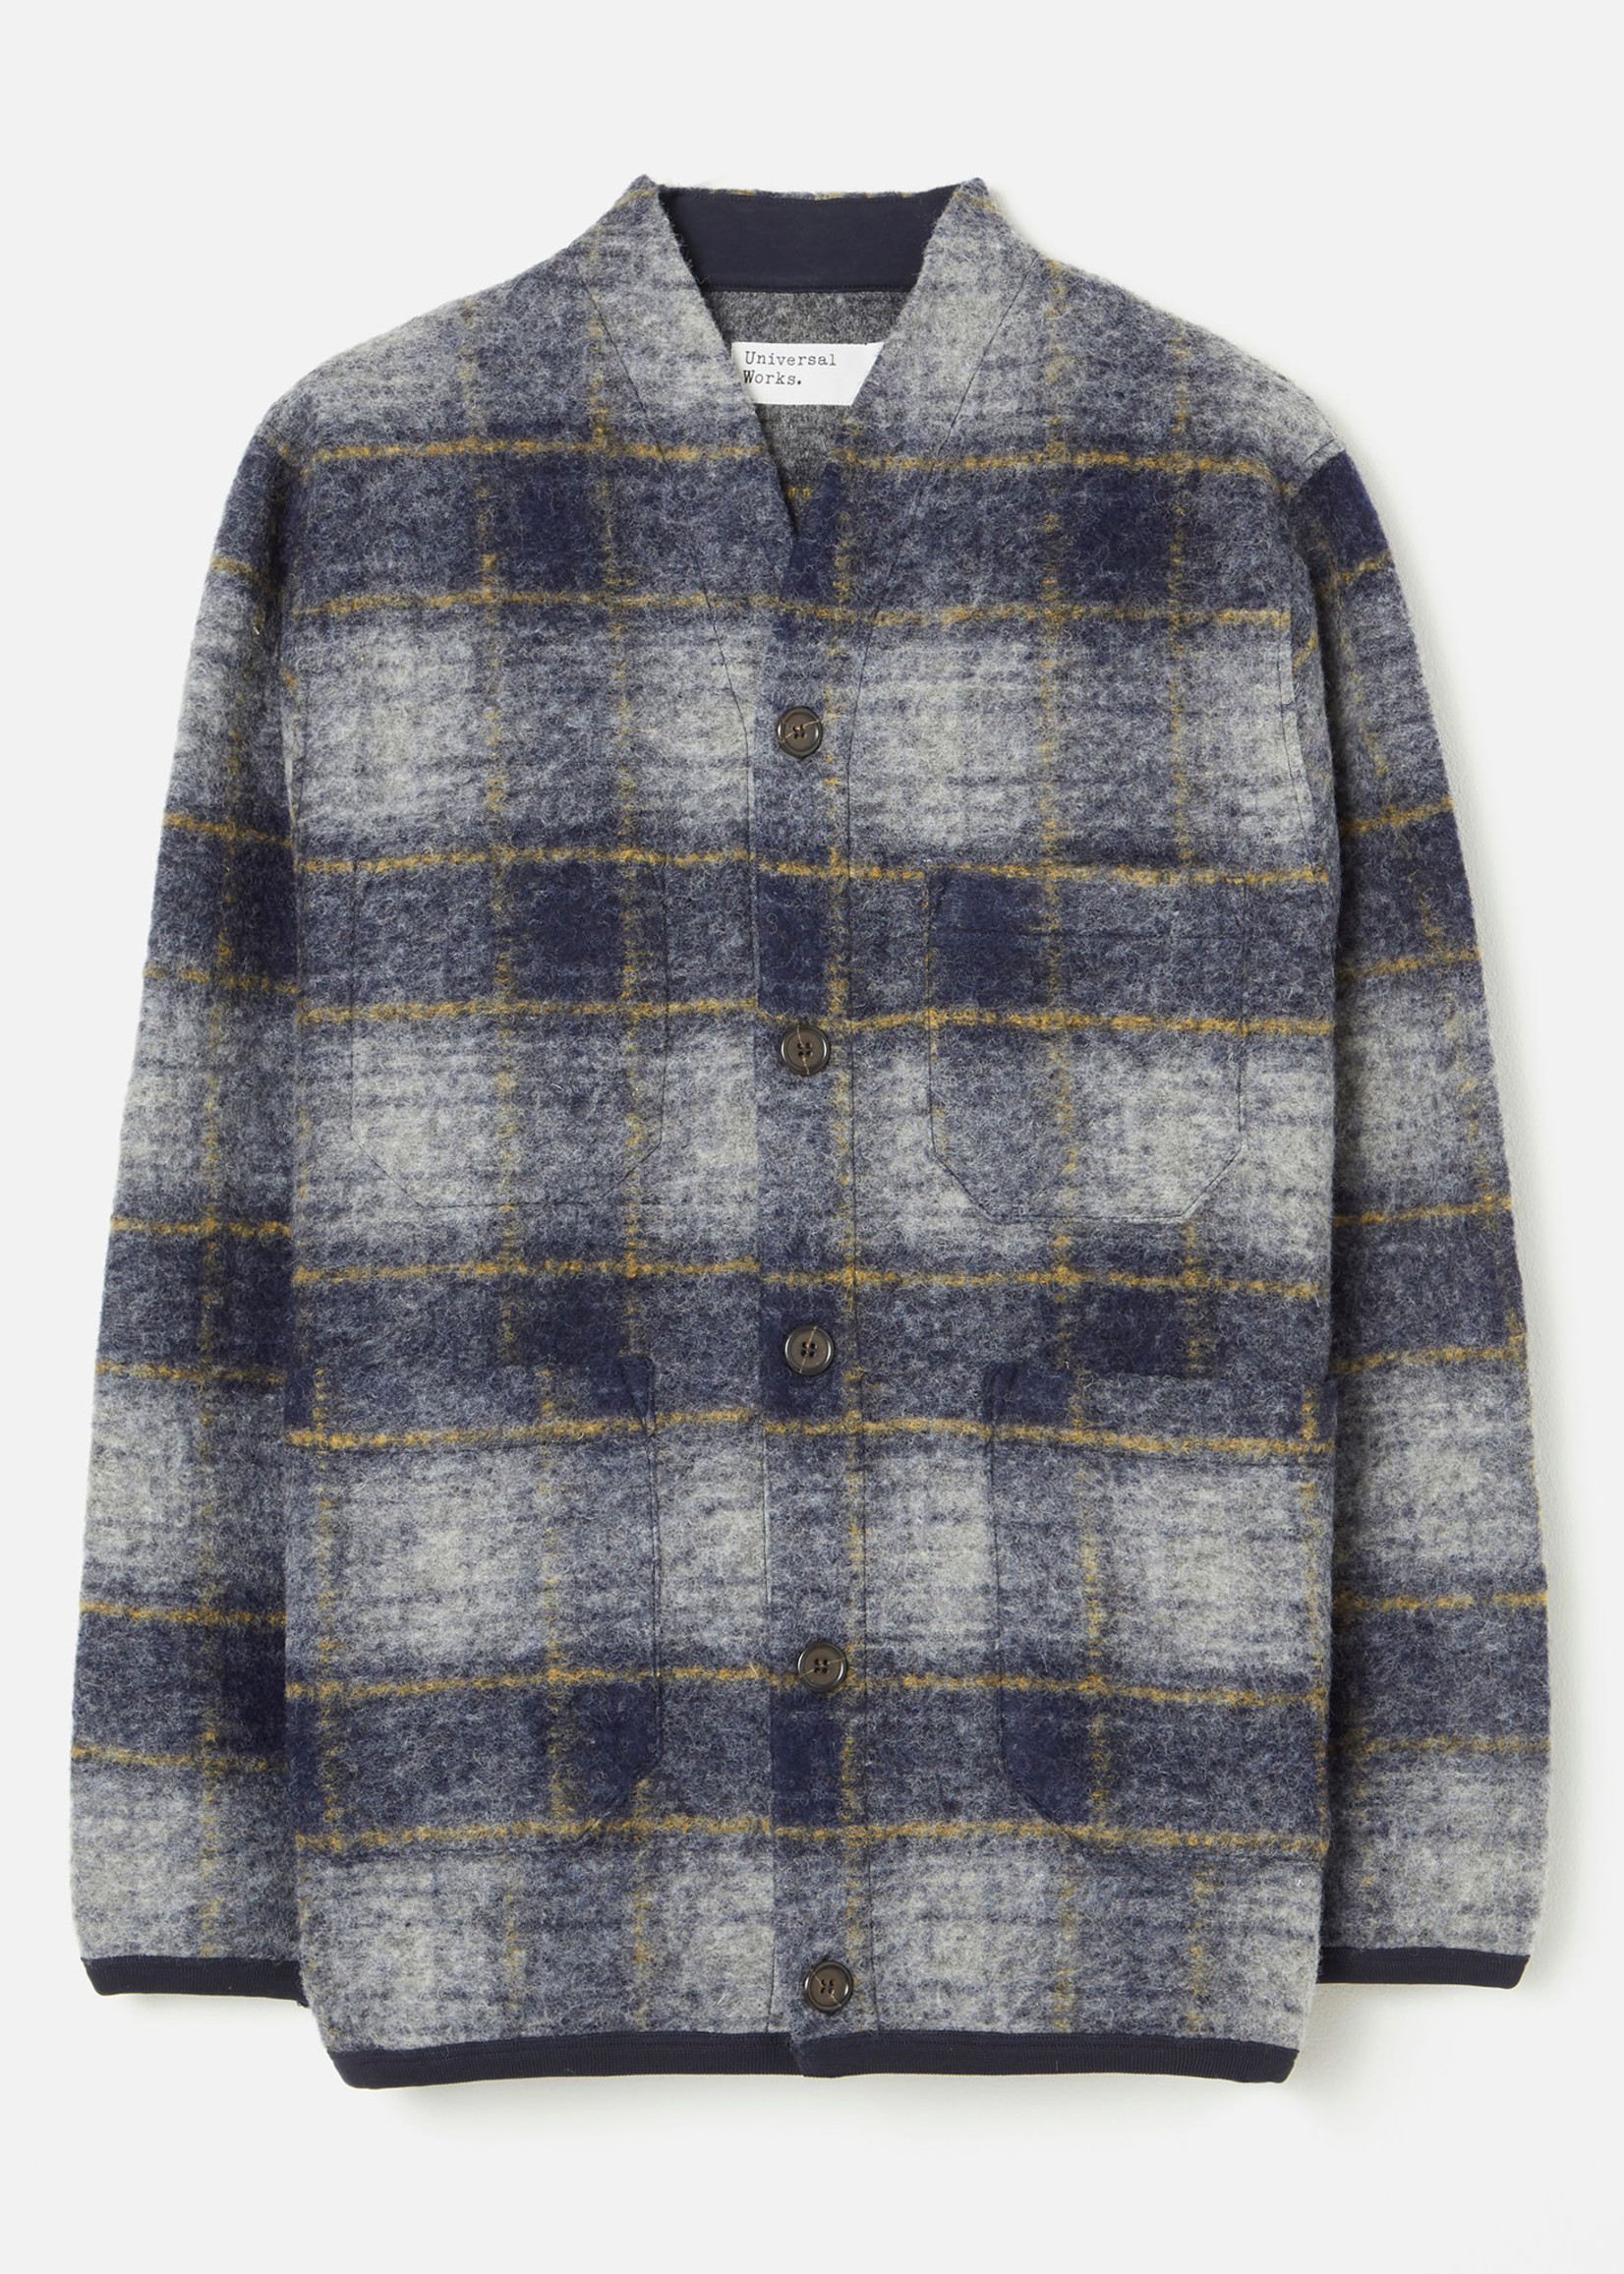 Universal Works Austin Cardigan Navy Plaid Wool Fleece by Universal Works